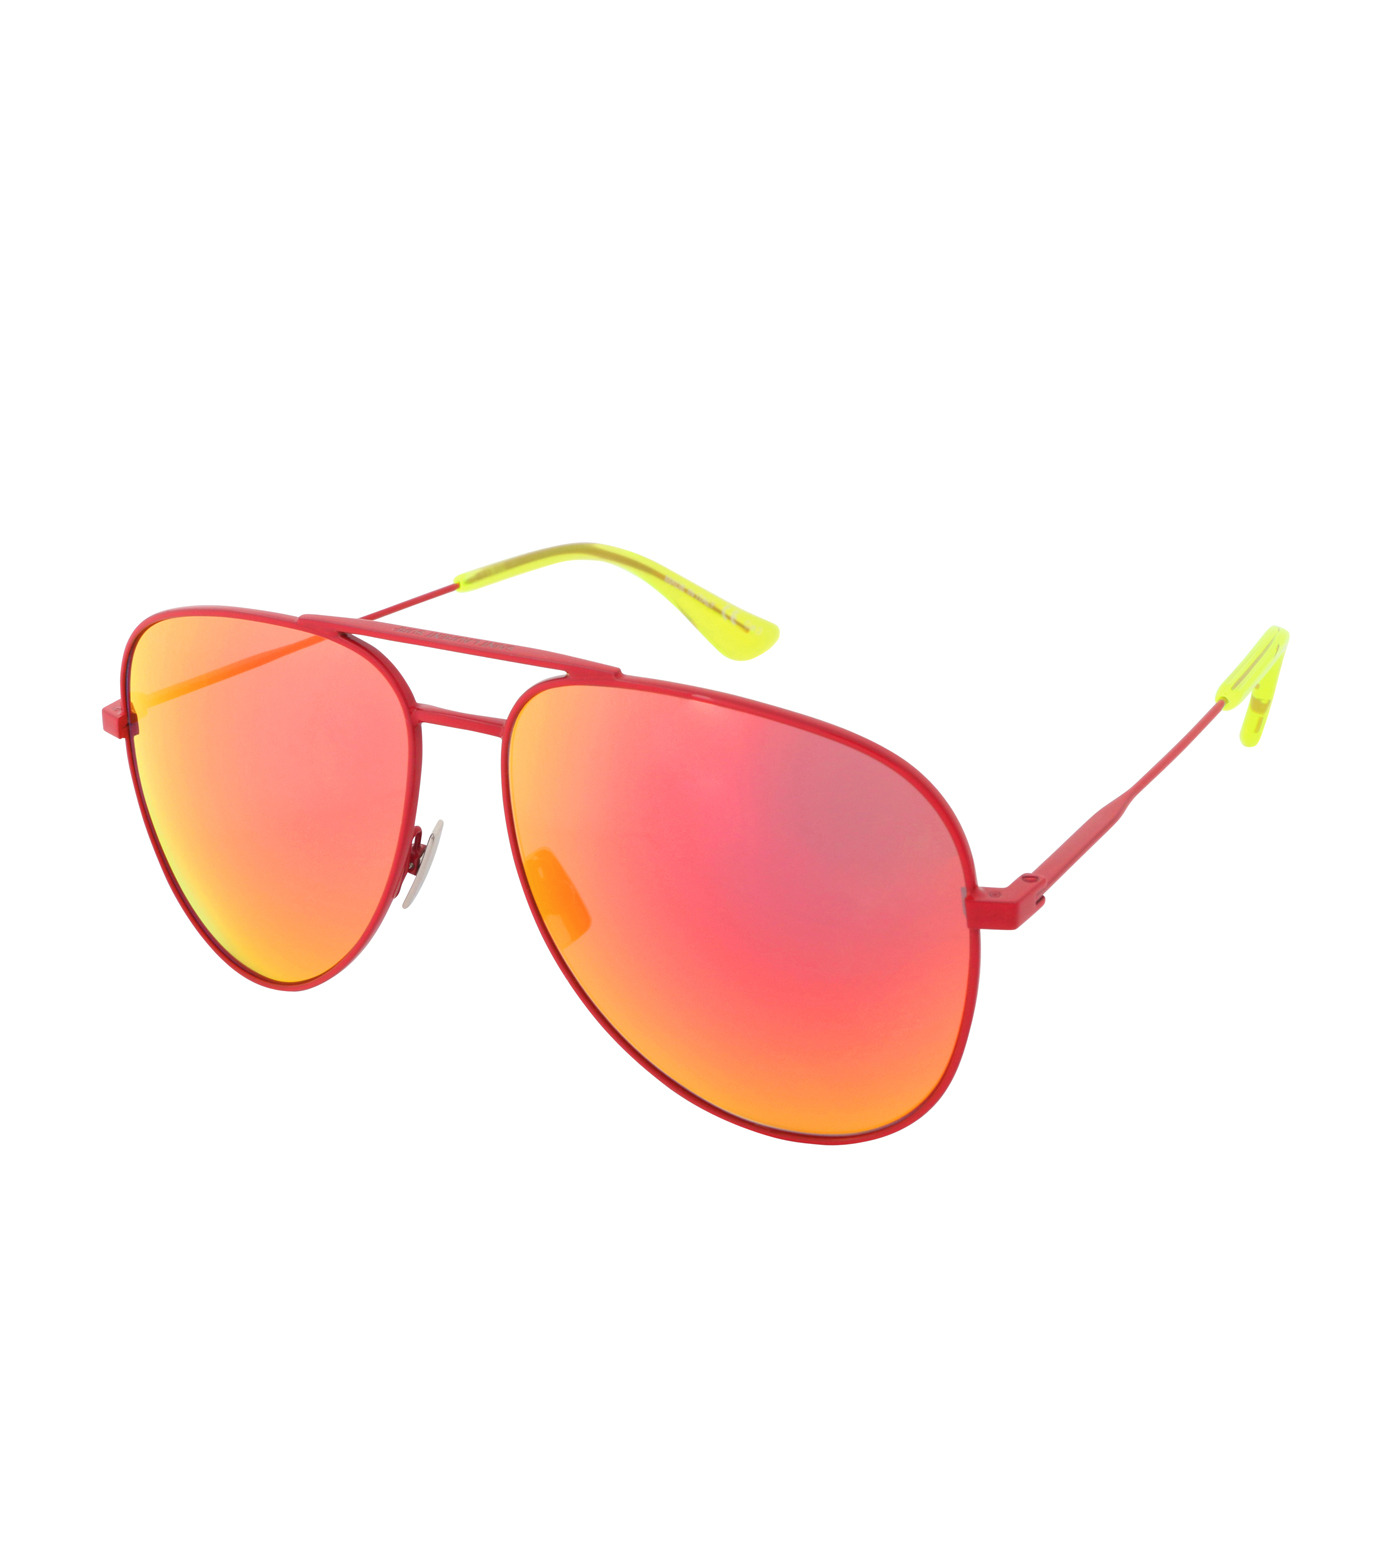 SAINT LAURENT(サンローラン)のTeardrop-PINK(アイウェア/eyewear)-427758-Y9902-72 拡大詳細画像1